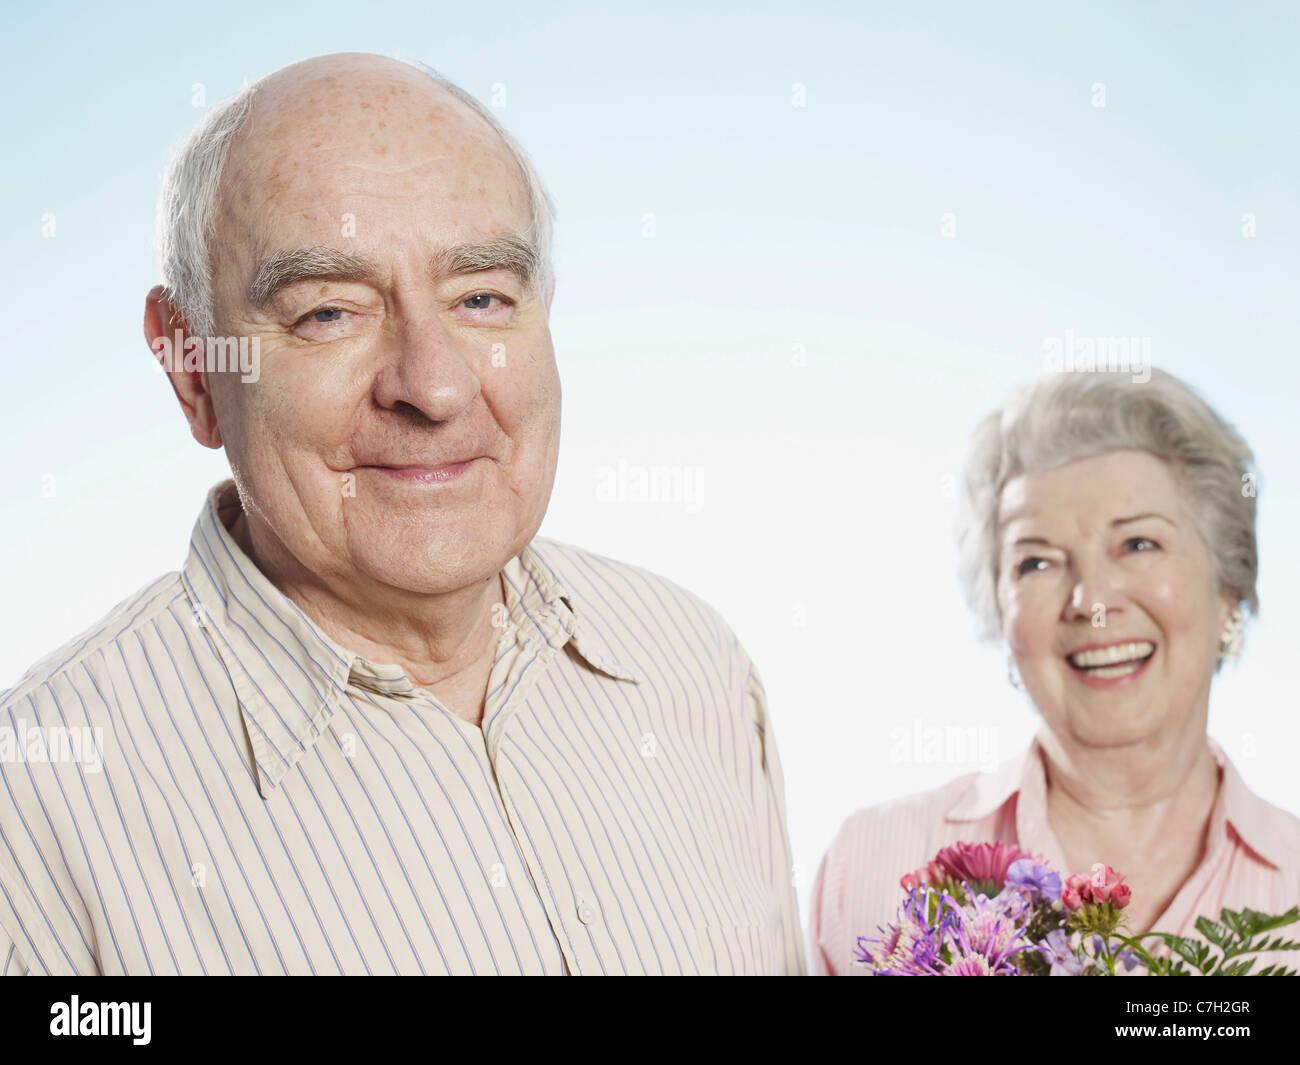 Senior man looks pleased that she likes the flowers Stock Photo